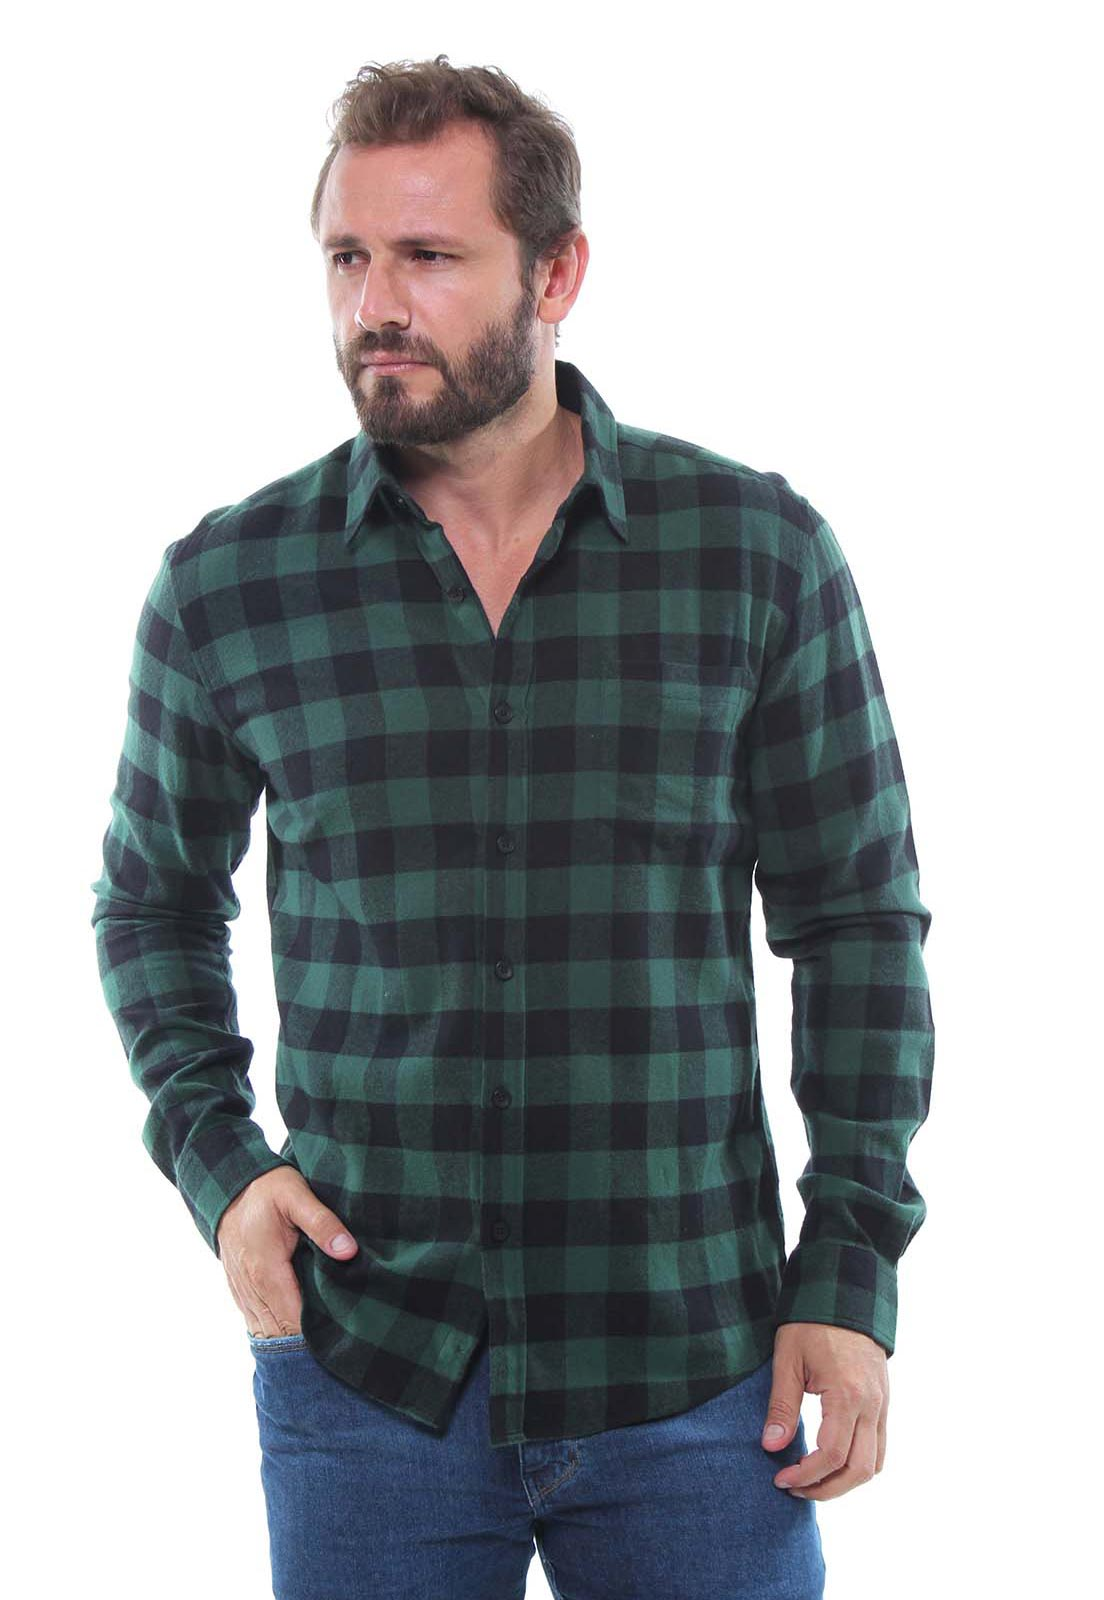 Camisa Masculina Flanelada Manga Longa Xadrez Crocker - 47393  - CROCKER JEANS